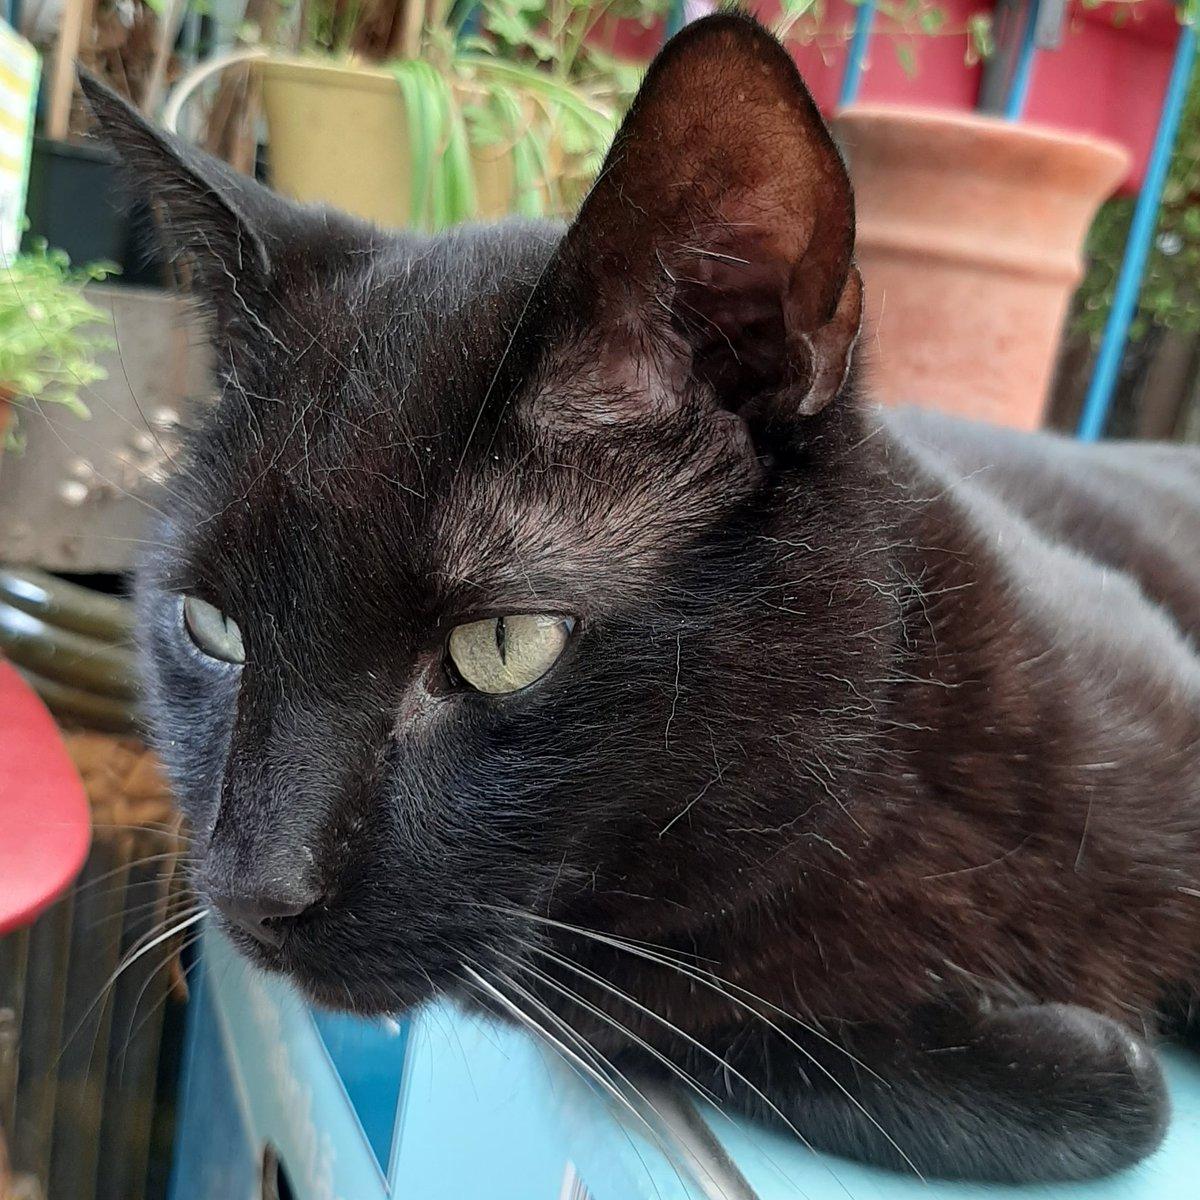 Der Kater freut sich aufs Wochenende. Er sieht es schon nahen. #katertag #catcontent #catstagram #catsofinstagram #ilovecats #catsruletheworld #blackcat #homeiswherethecatis #miau #meow #tgifpic.twitter.com/9i5xsCFsRt  by WalkingInTheClouds